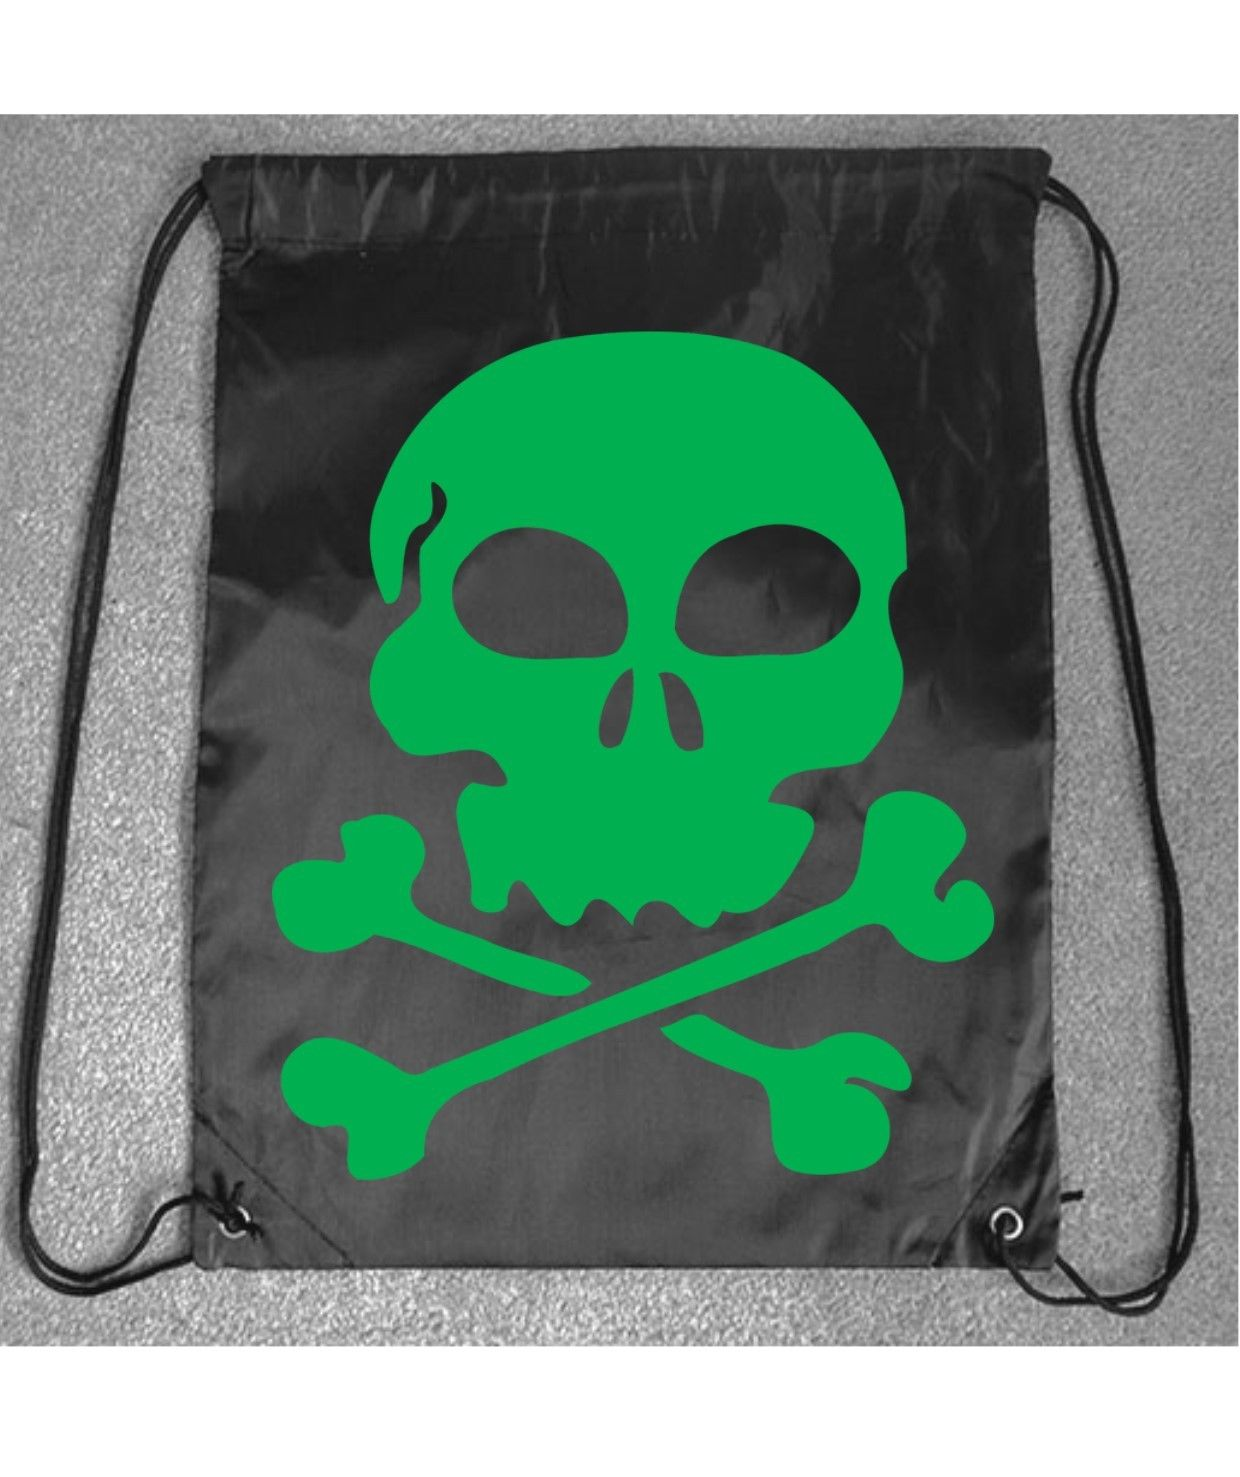 9300fee001 Skeleton Skull Green Funny PE Gym Bag Printed Drawstring Fitness Sport  Workout